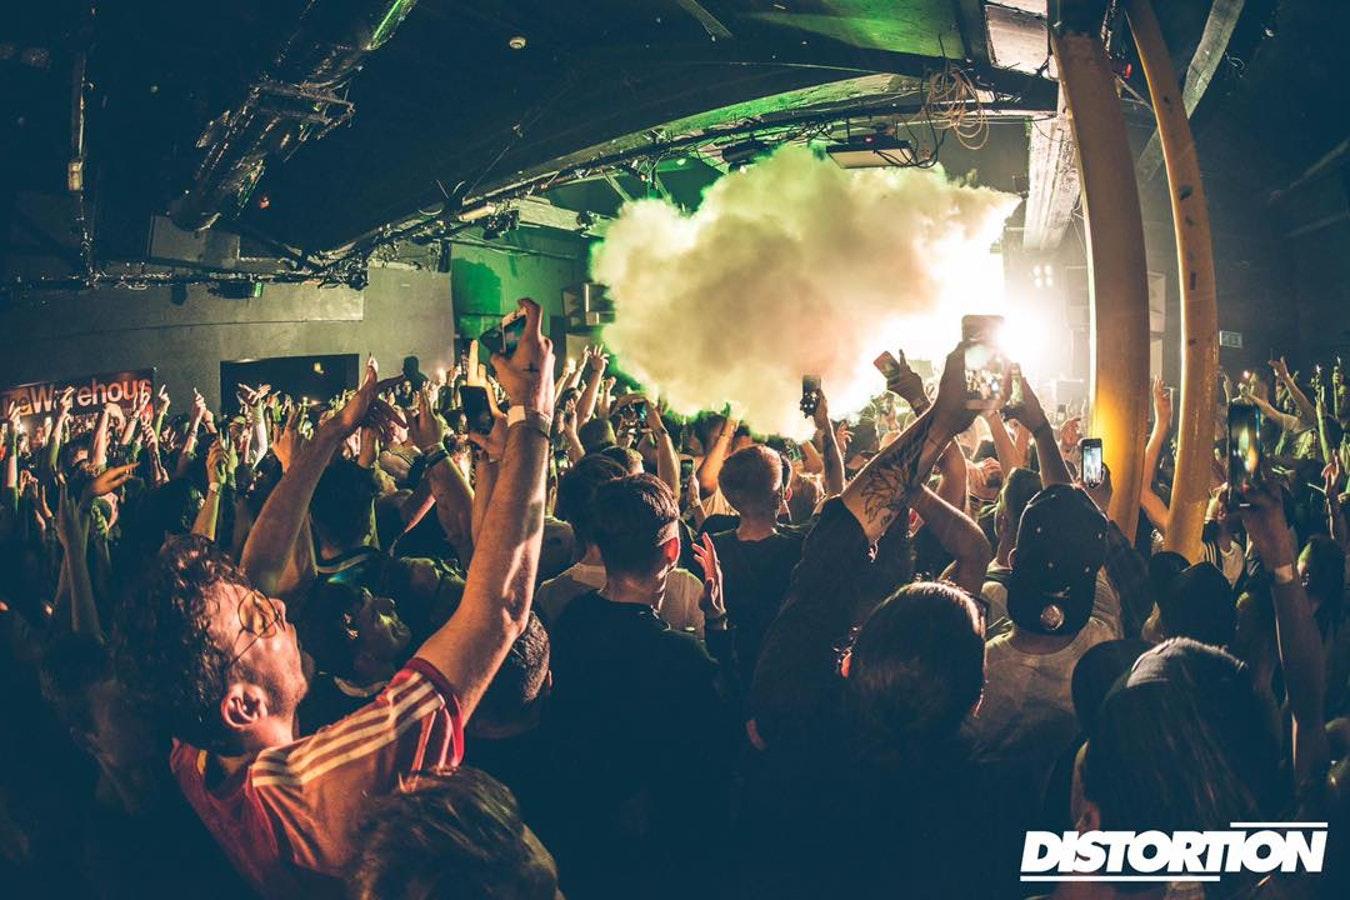 Distortion x Lengoland: TS7: Clockworks UK Tour – The Warehouse Leeds